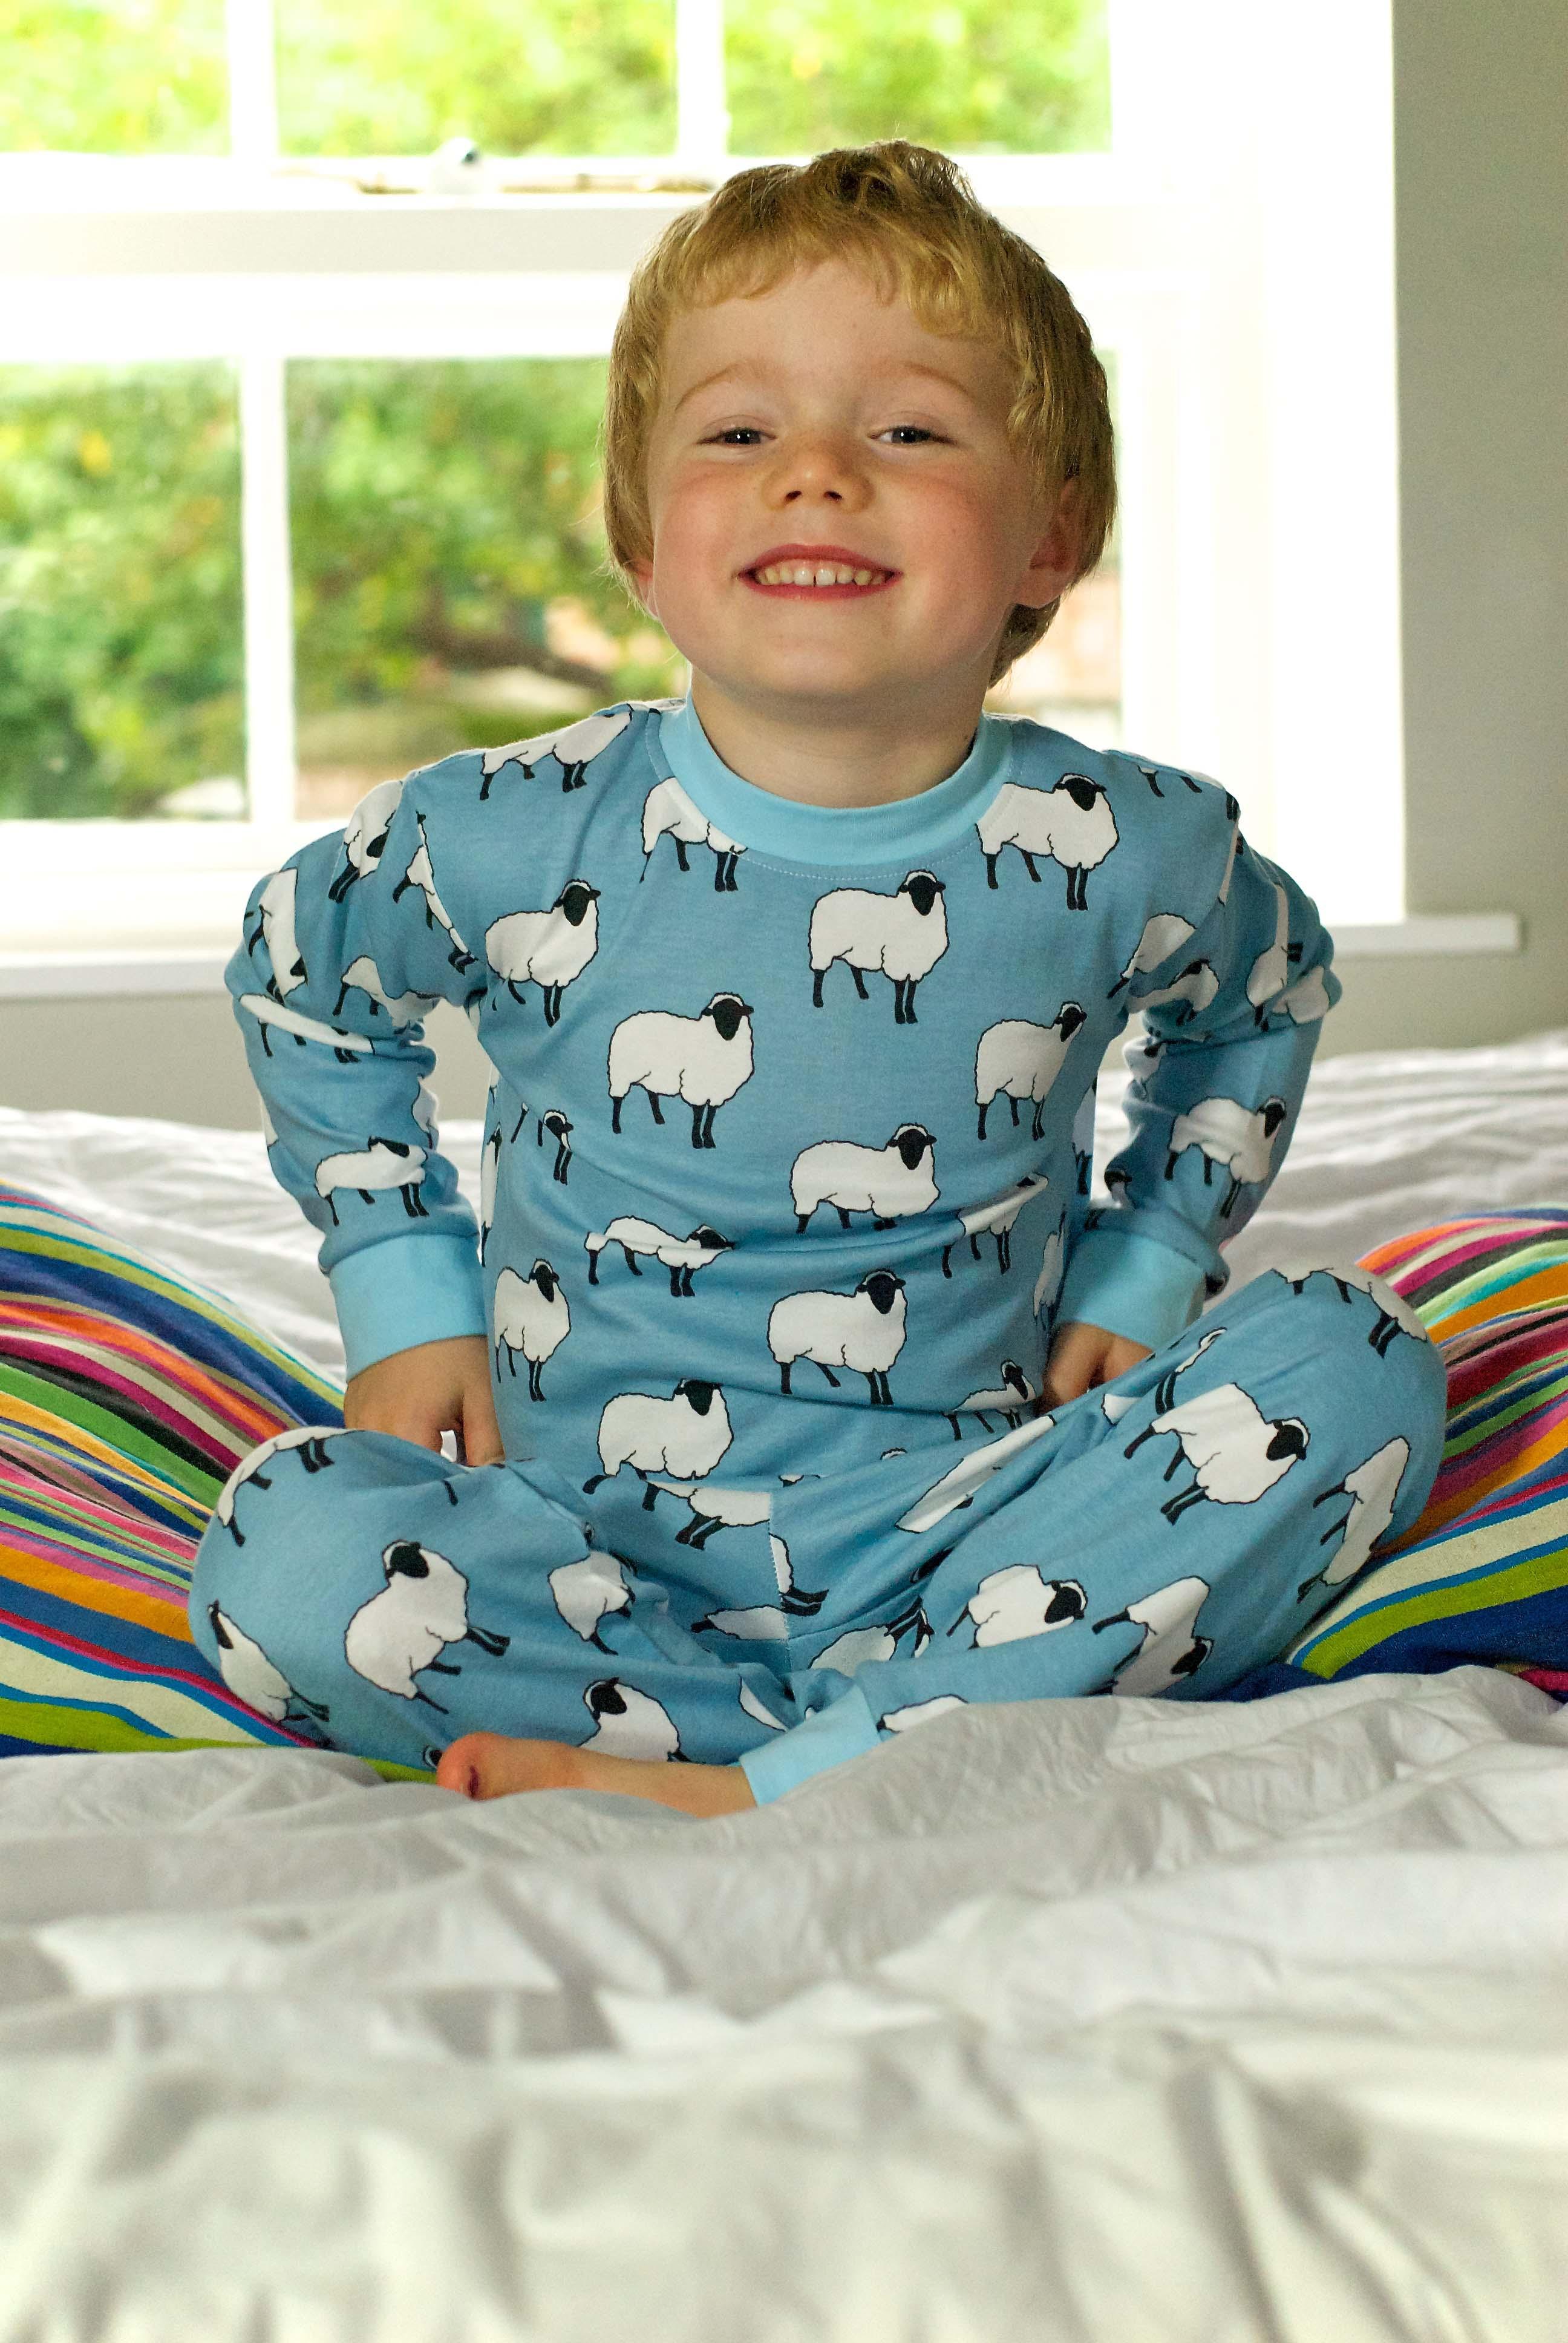 bf1928d0a6 Angus The Sheep Pyjamas - The Pyjama Store